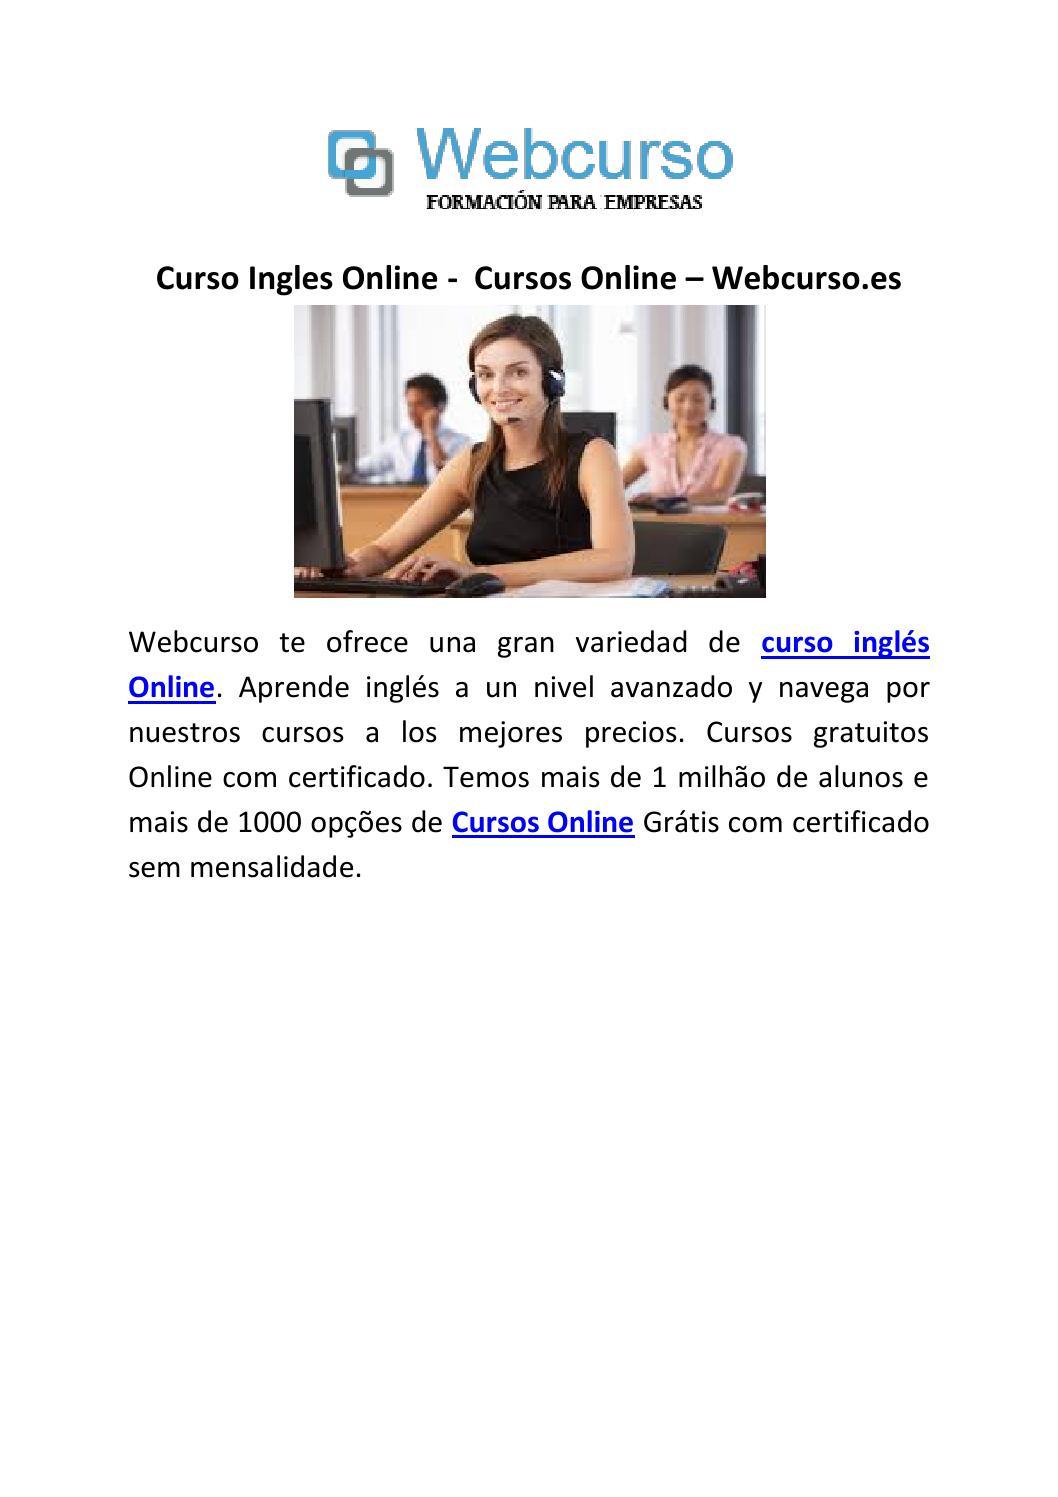 Curso Ingles Online Cursos Online Webcurso Es By Pashanjel Issuu